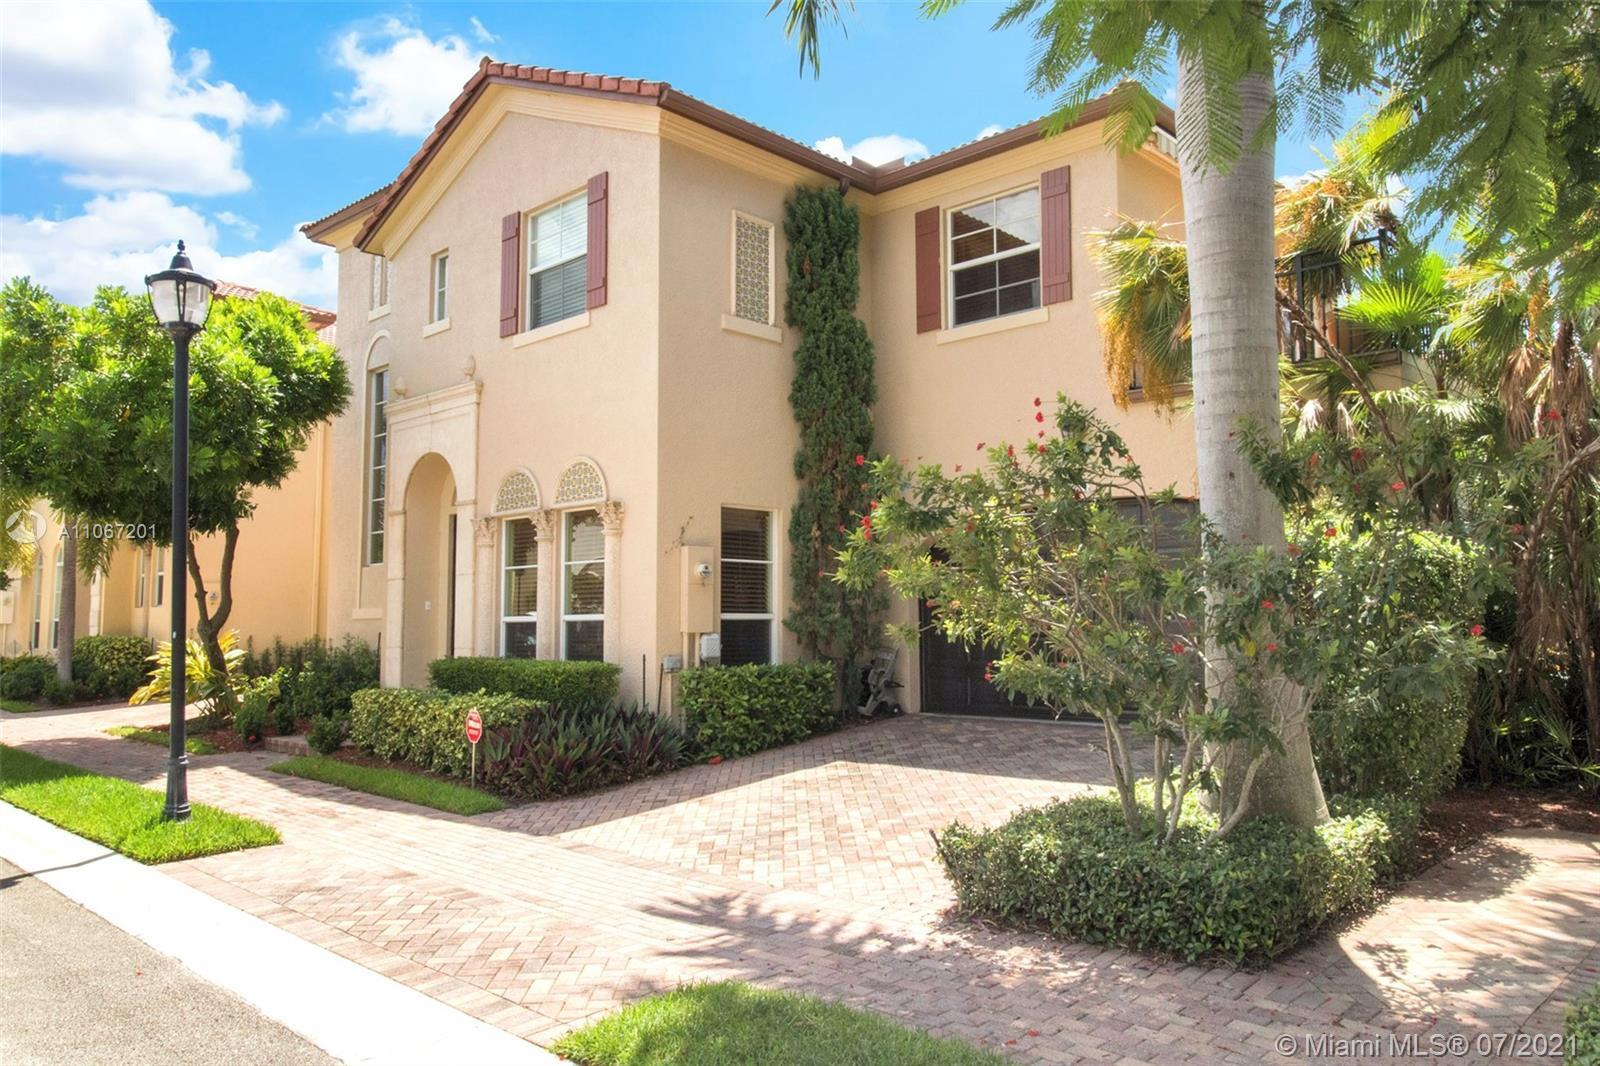 Live in Luxury! Spanish Colonial Façade community. 4 bed 3 bath w/ 2 car garage in the beautiful Roy